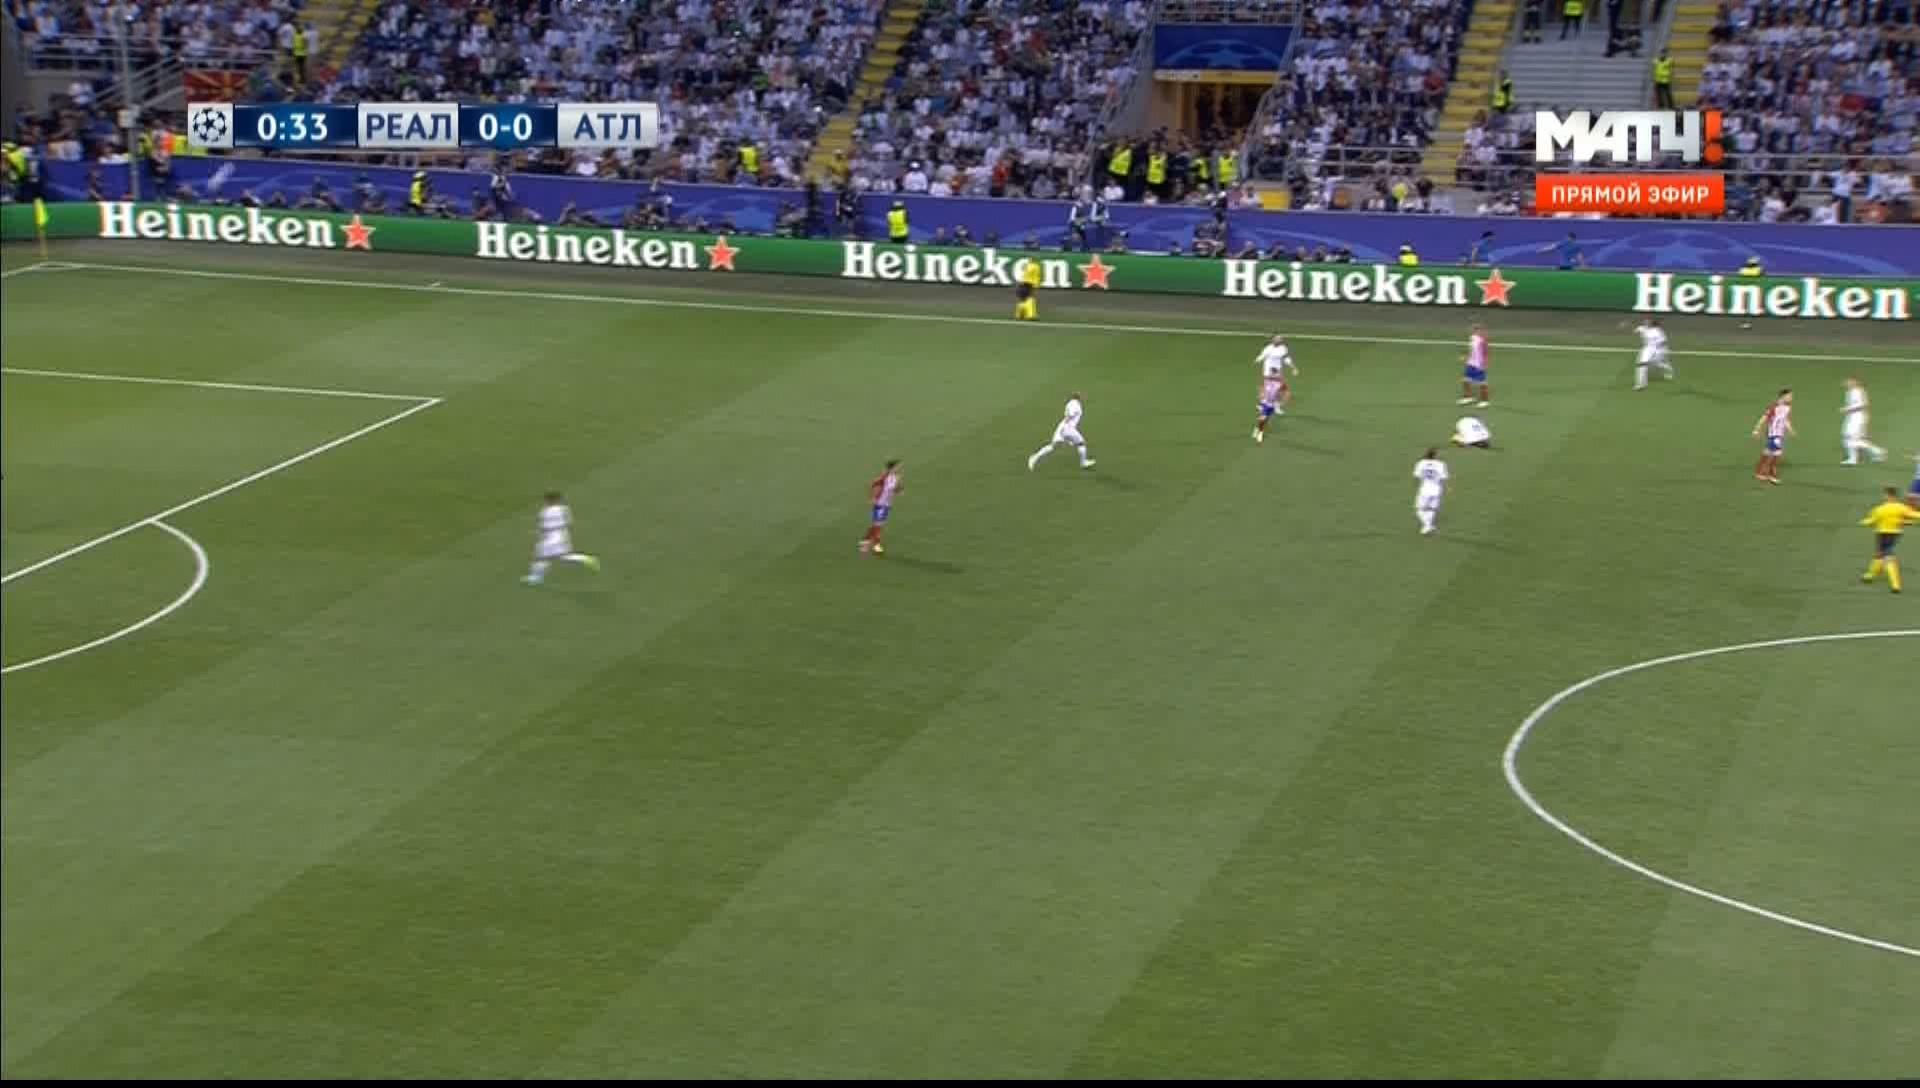 Лига Чемпионов 2015-2016  Финал  Реал Мадрид (Испания) - Атлетико Мадрид (Испания)  Матч ТВ.ts_20160529_035454.171.jpg